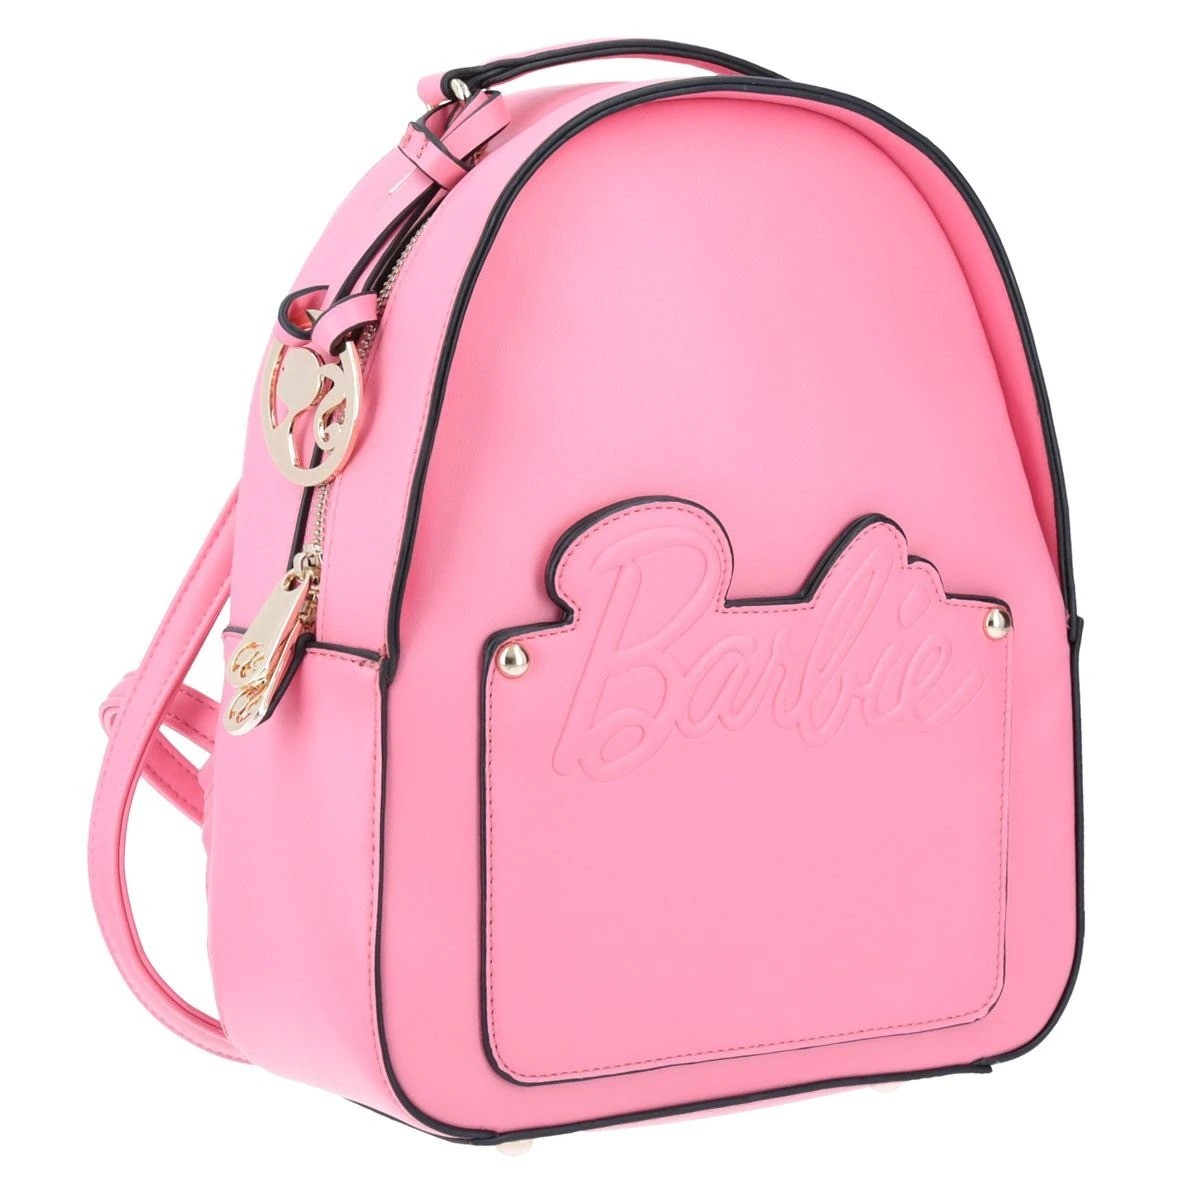 Bolsa Mochila Barbie Rosa D55